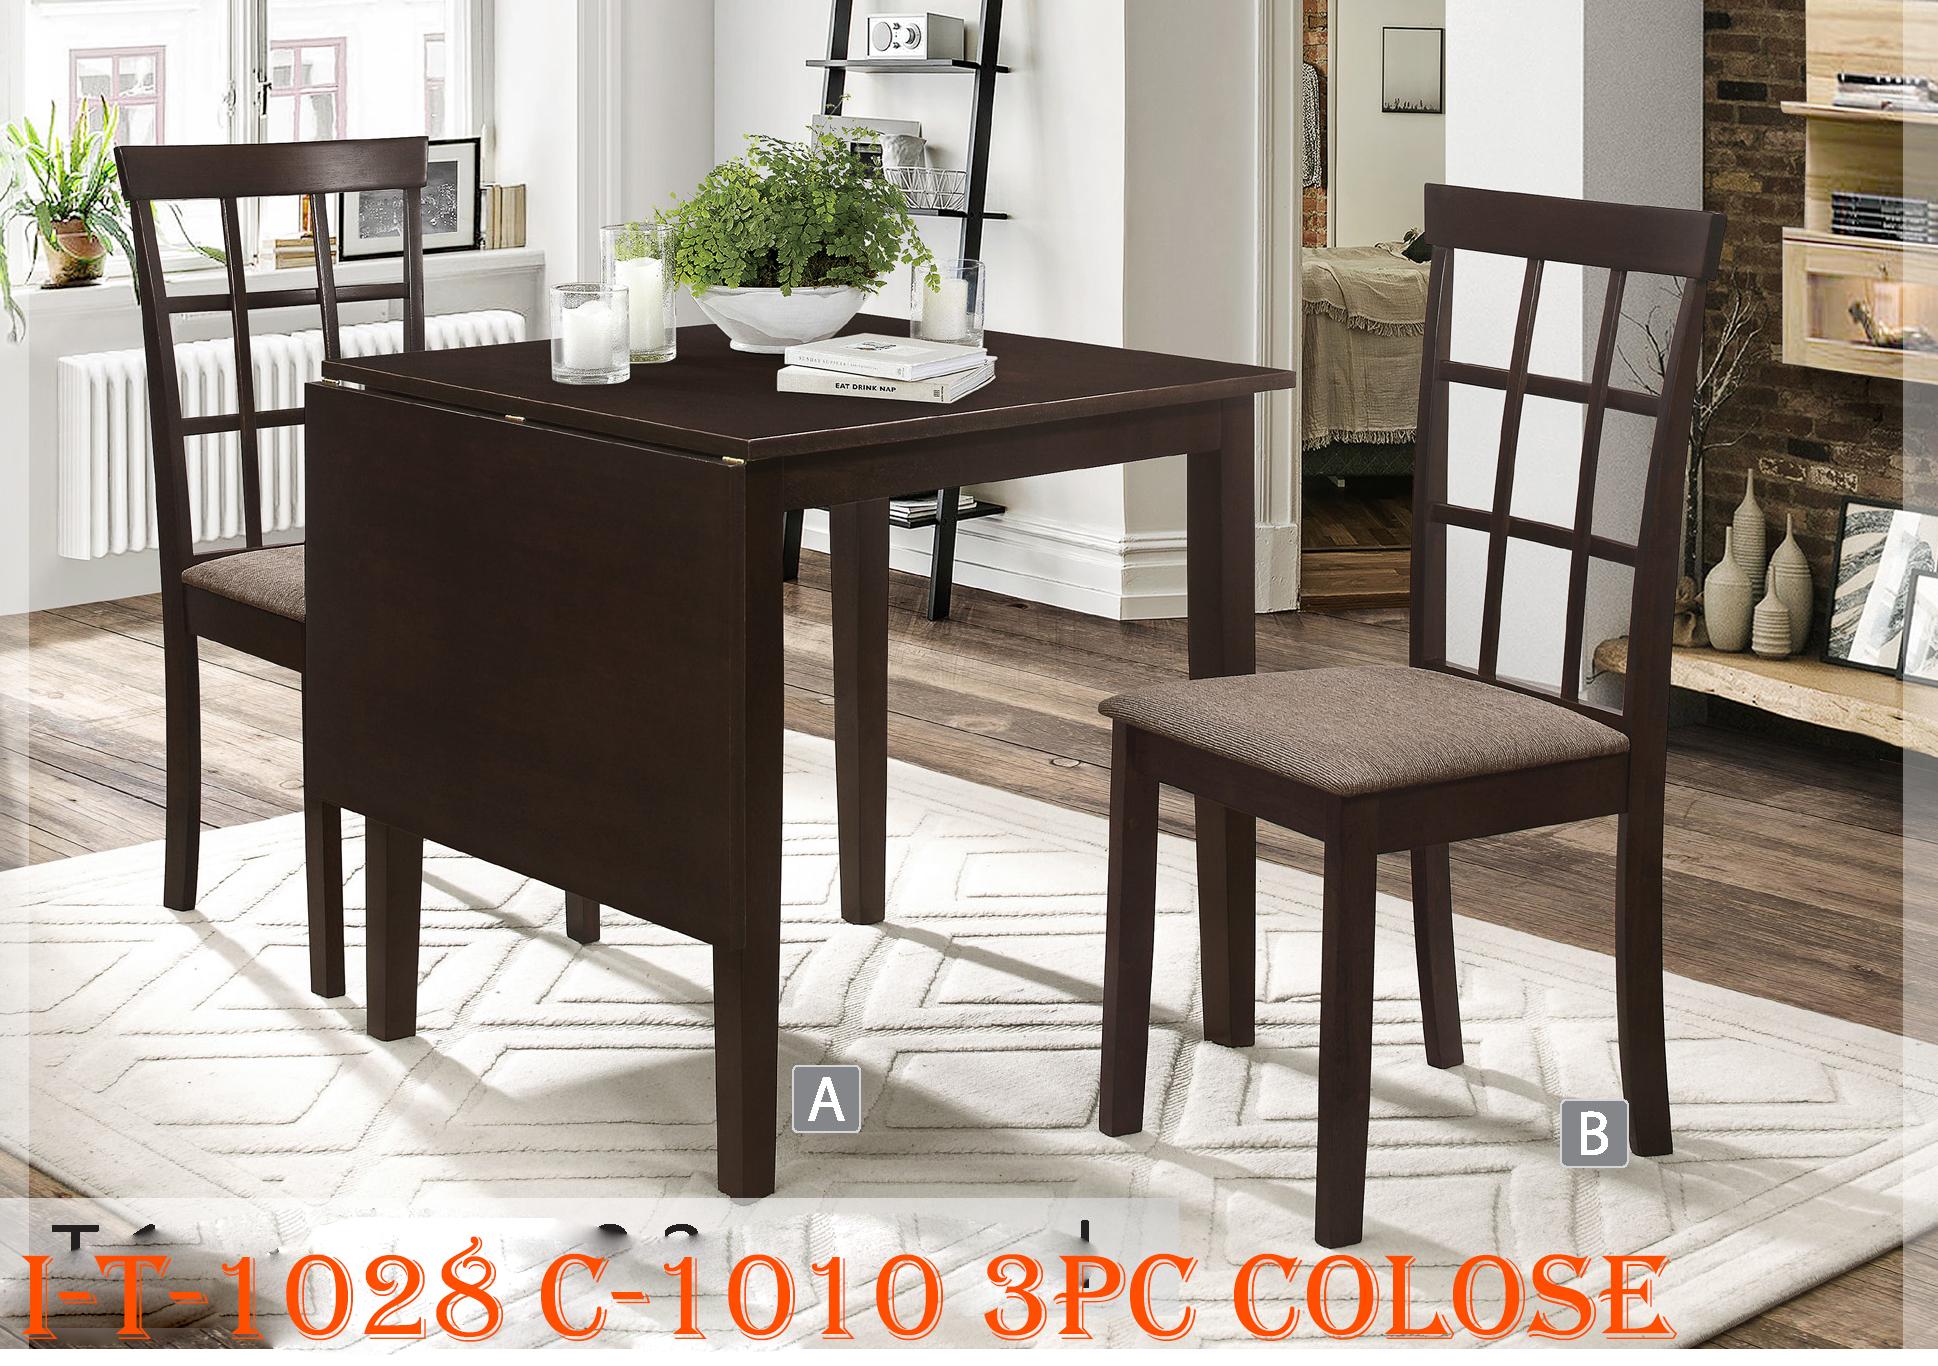 I-T-1028 C-1010 3PC COLOSE